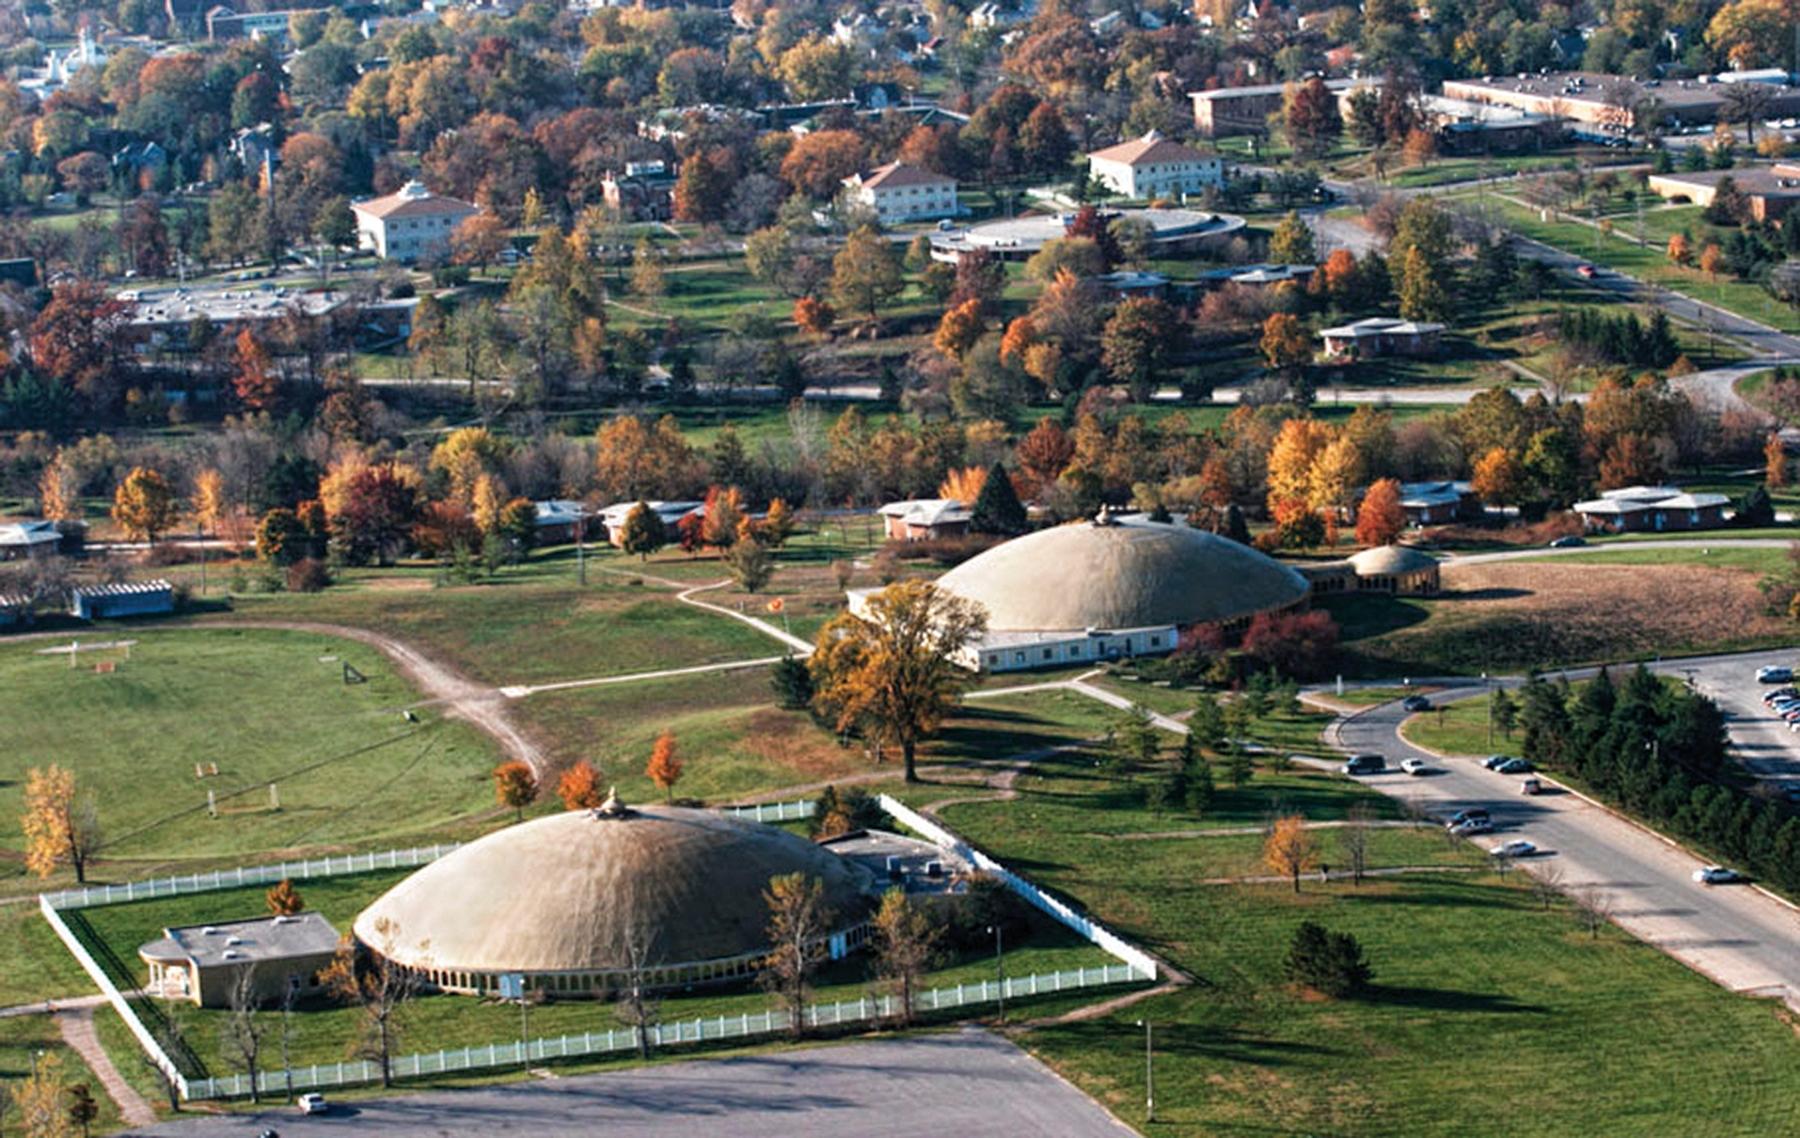 Aerial view of Maharishi International University's two domes.